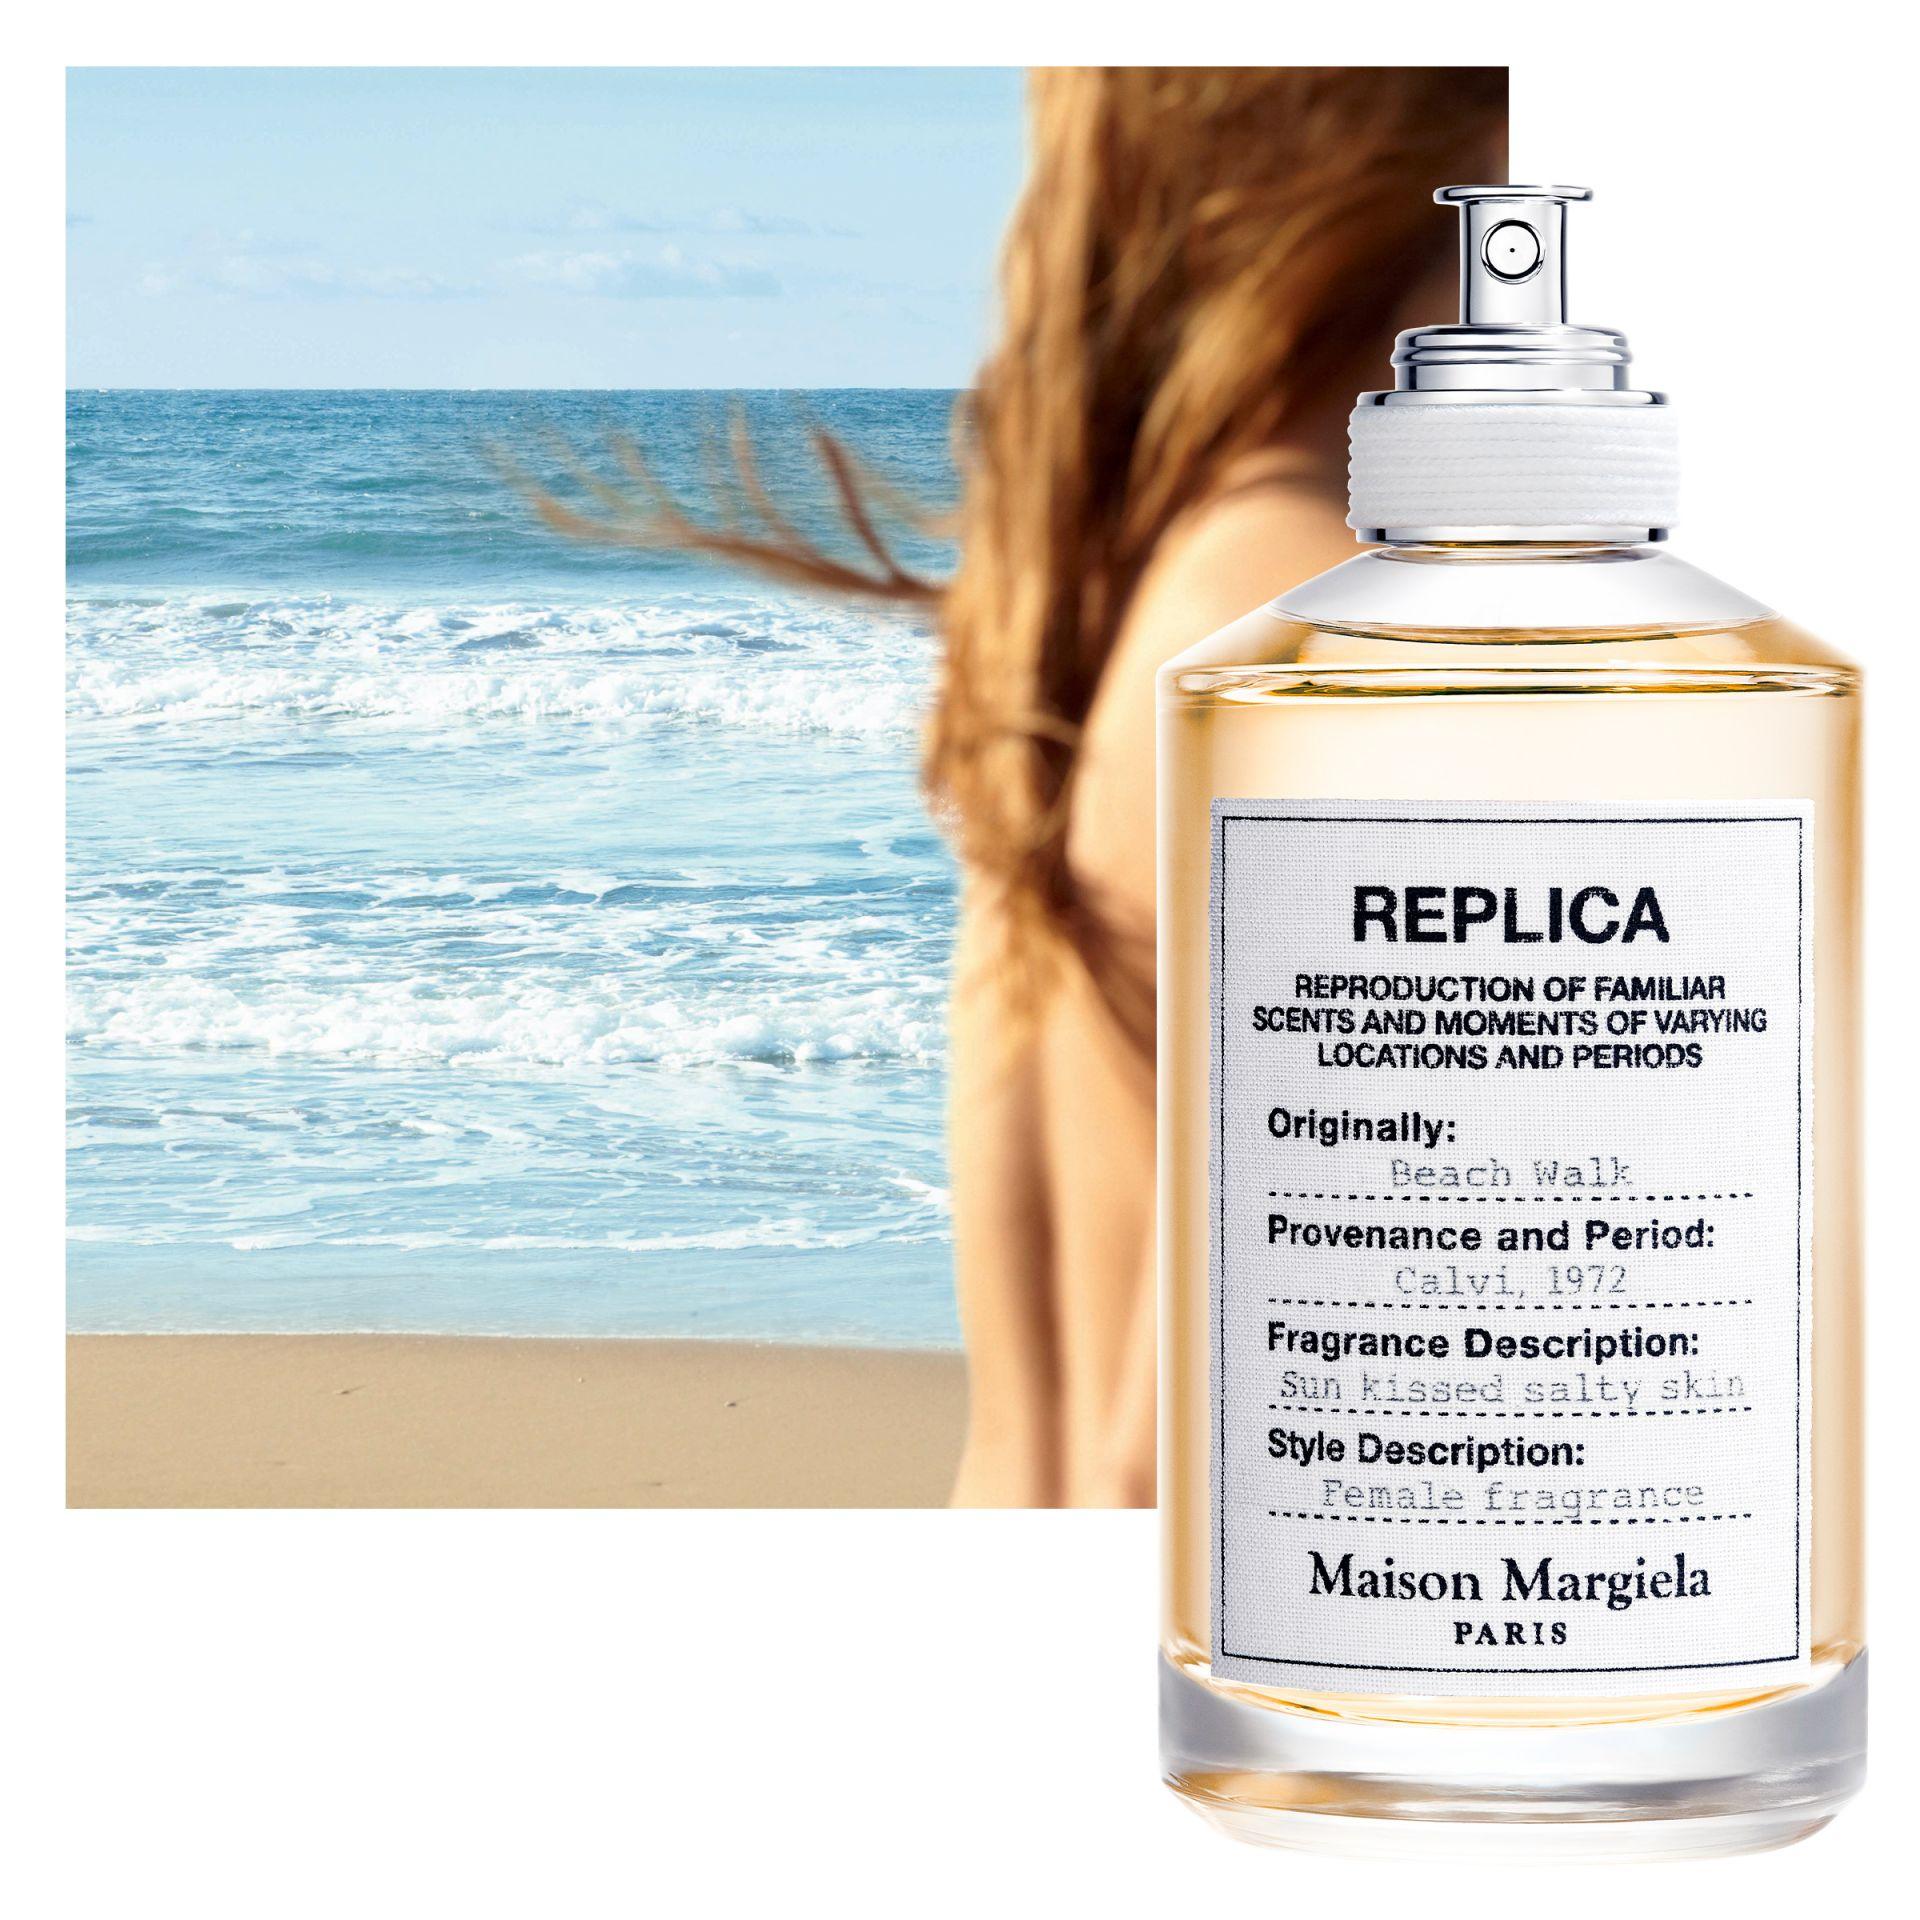 Maison Margiela PFM Replica Beach Walk